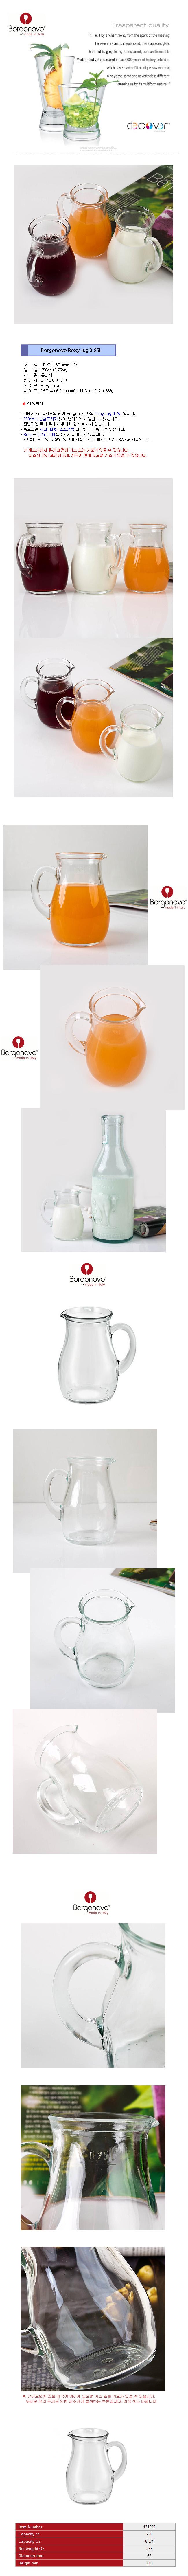 Borgonovo 록 시(R-oxy) Jug 0.25L 3P - 더리빙샵, 10,960원, 보틀/텀블러, 키친 물병